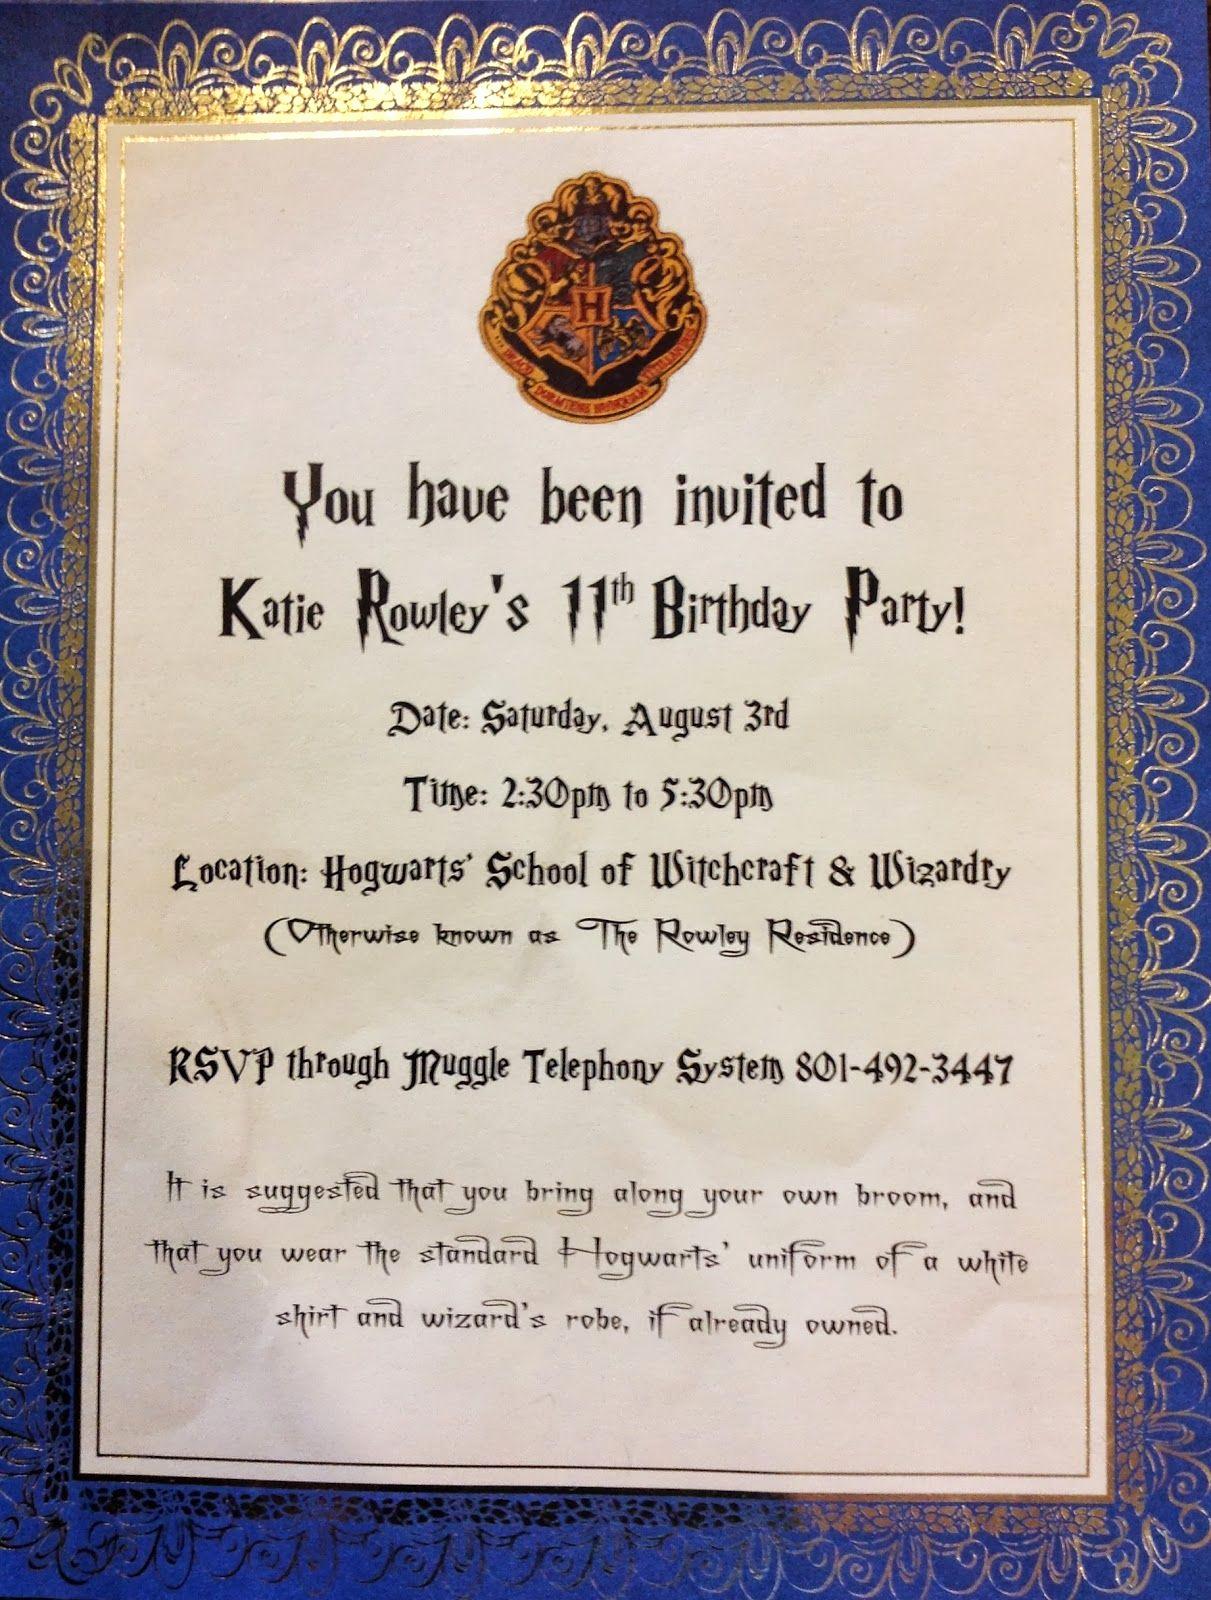 Harry Potter Birthday Invitation Fresh Puddle Wonderful Learning Harry Potter Birthday Party